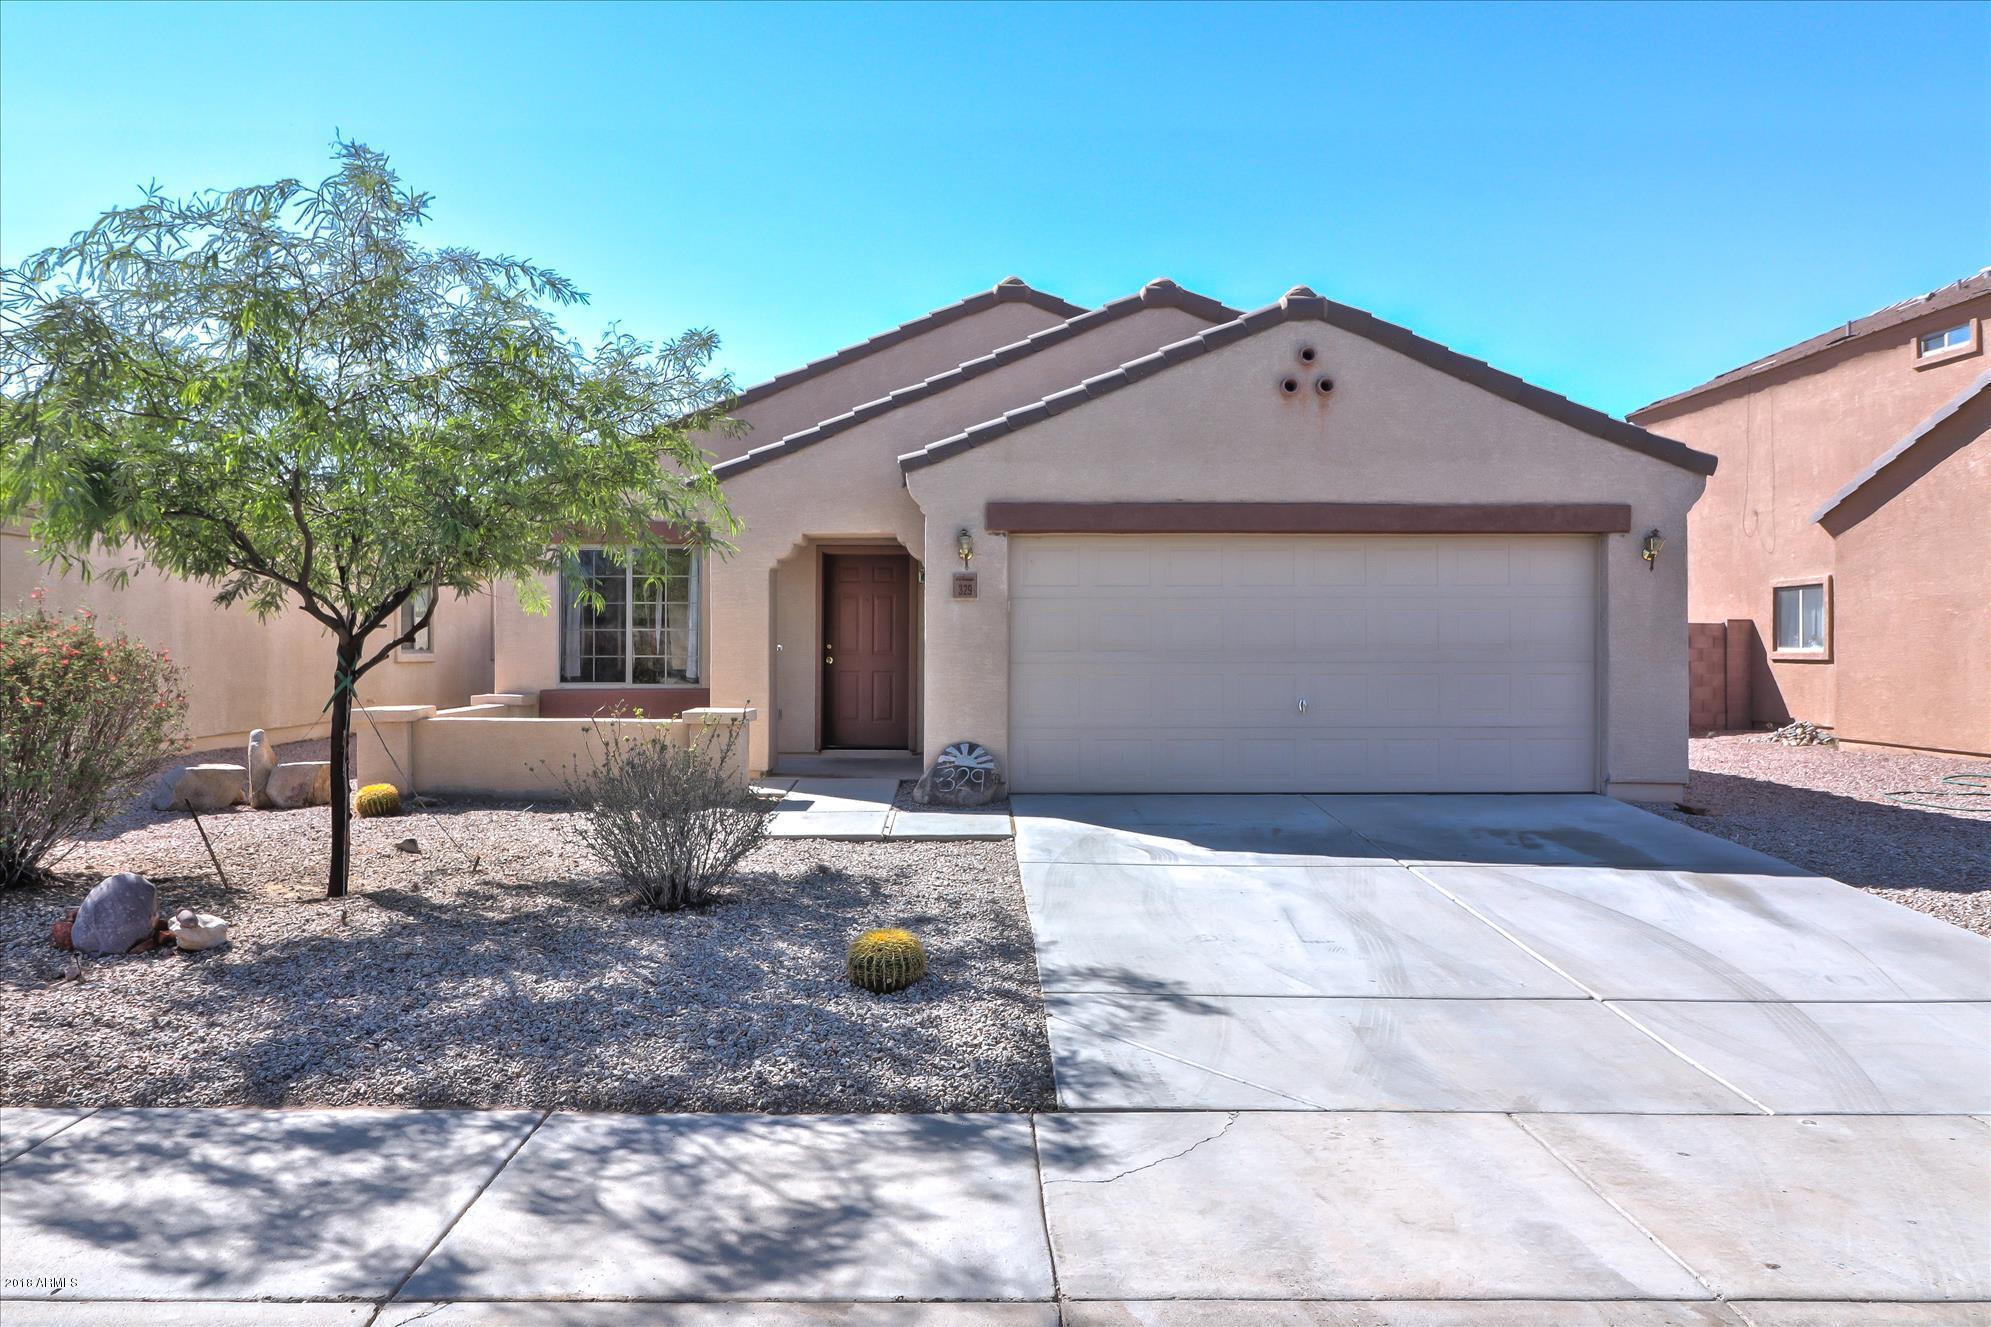 Photo for 329 W Phantom Drive, Casa Grande, AZ 85122 (MLS # 5822929)